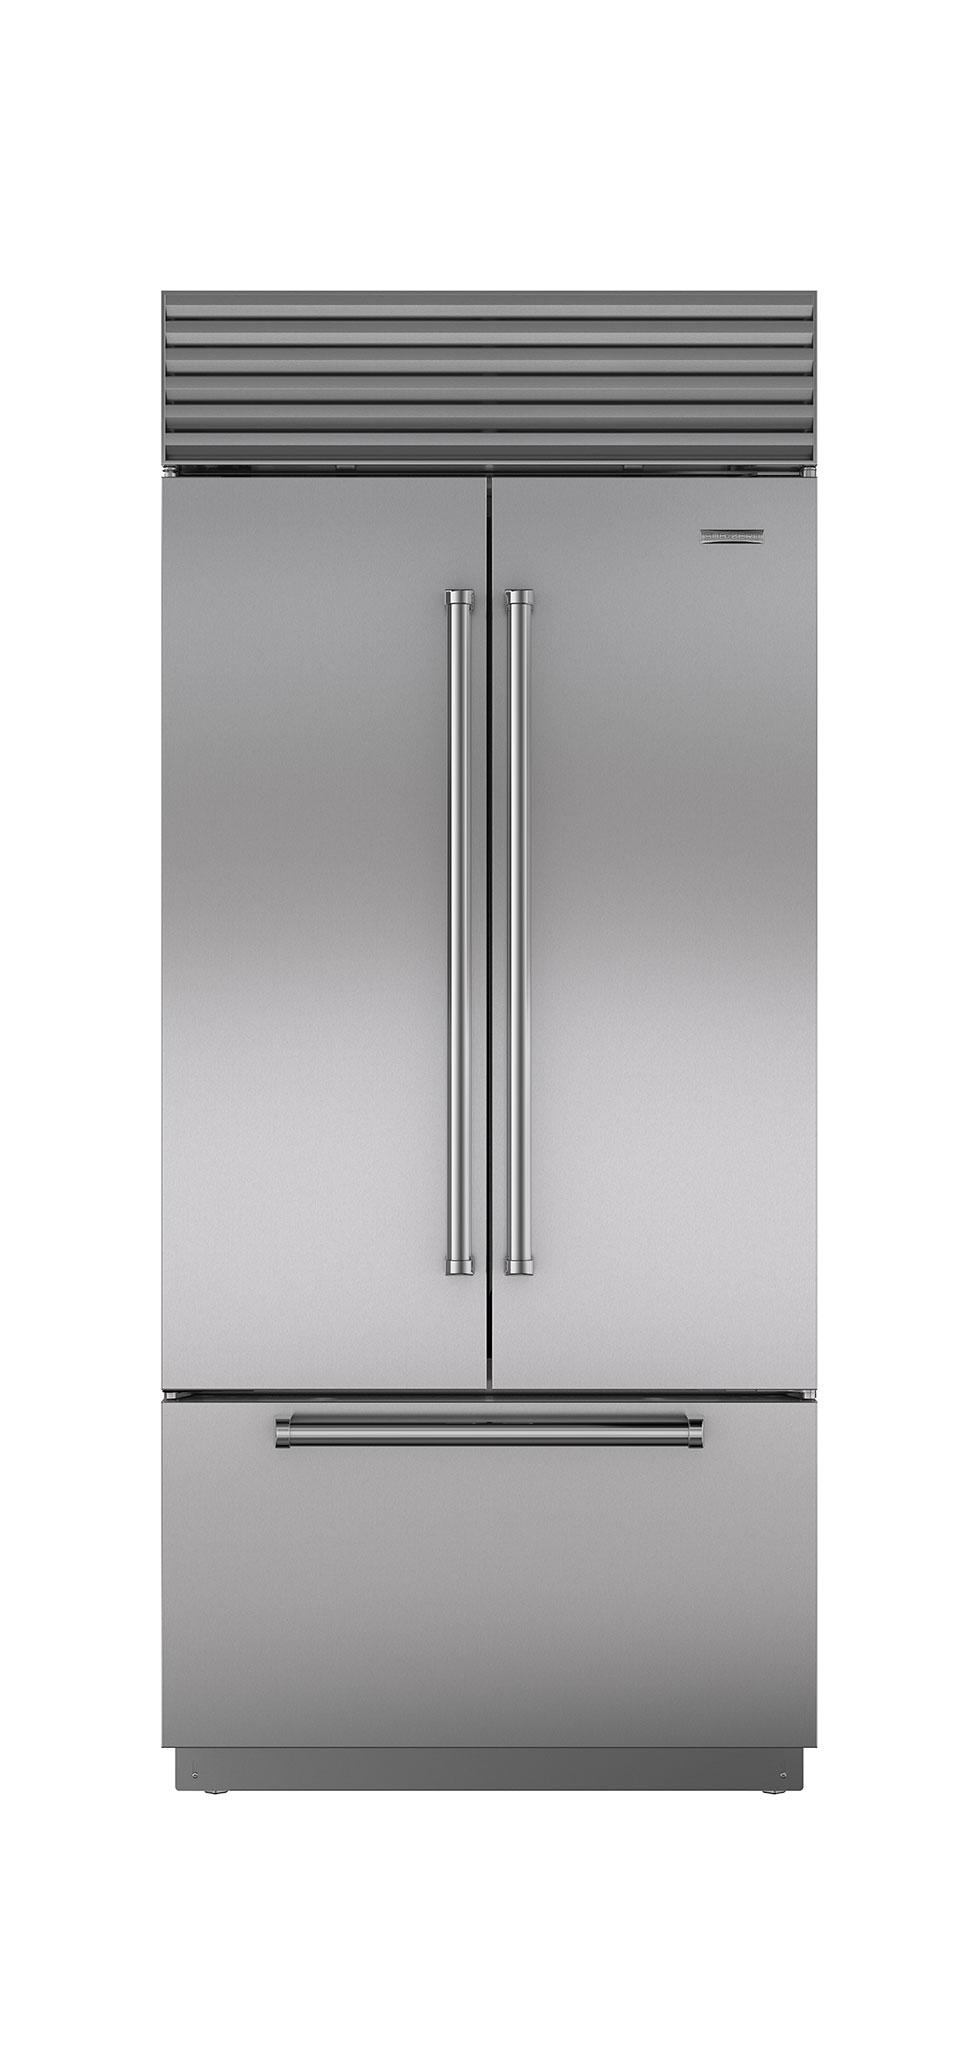 Genial /sub Zero/full Size Refrigeration/builtin Refrigerators/36